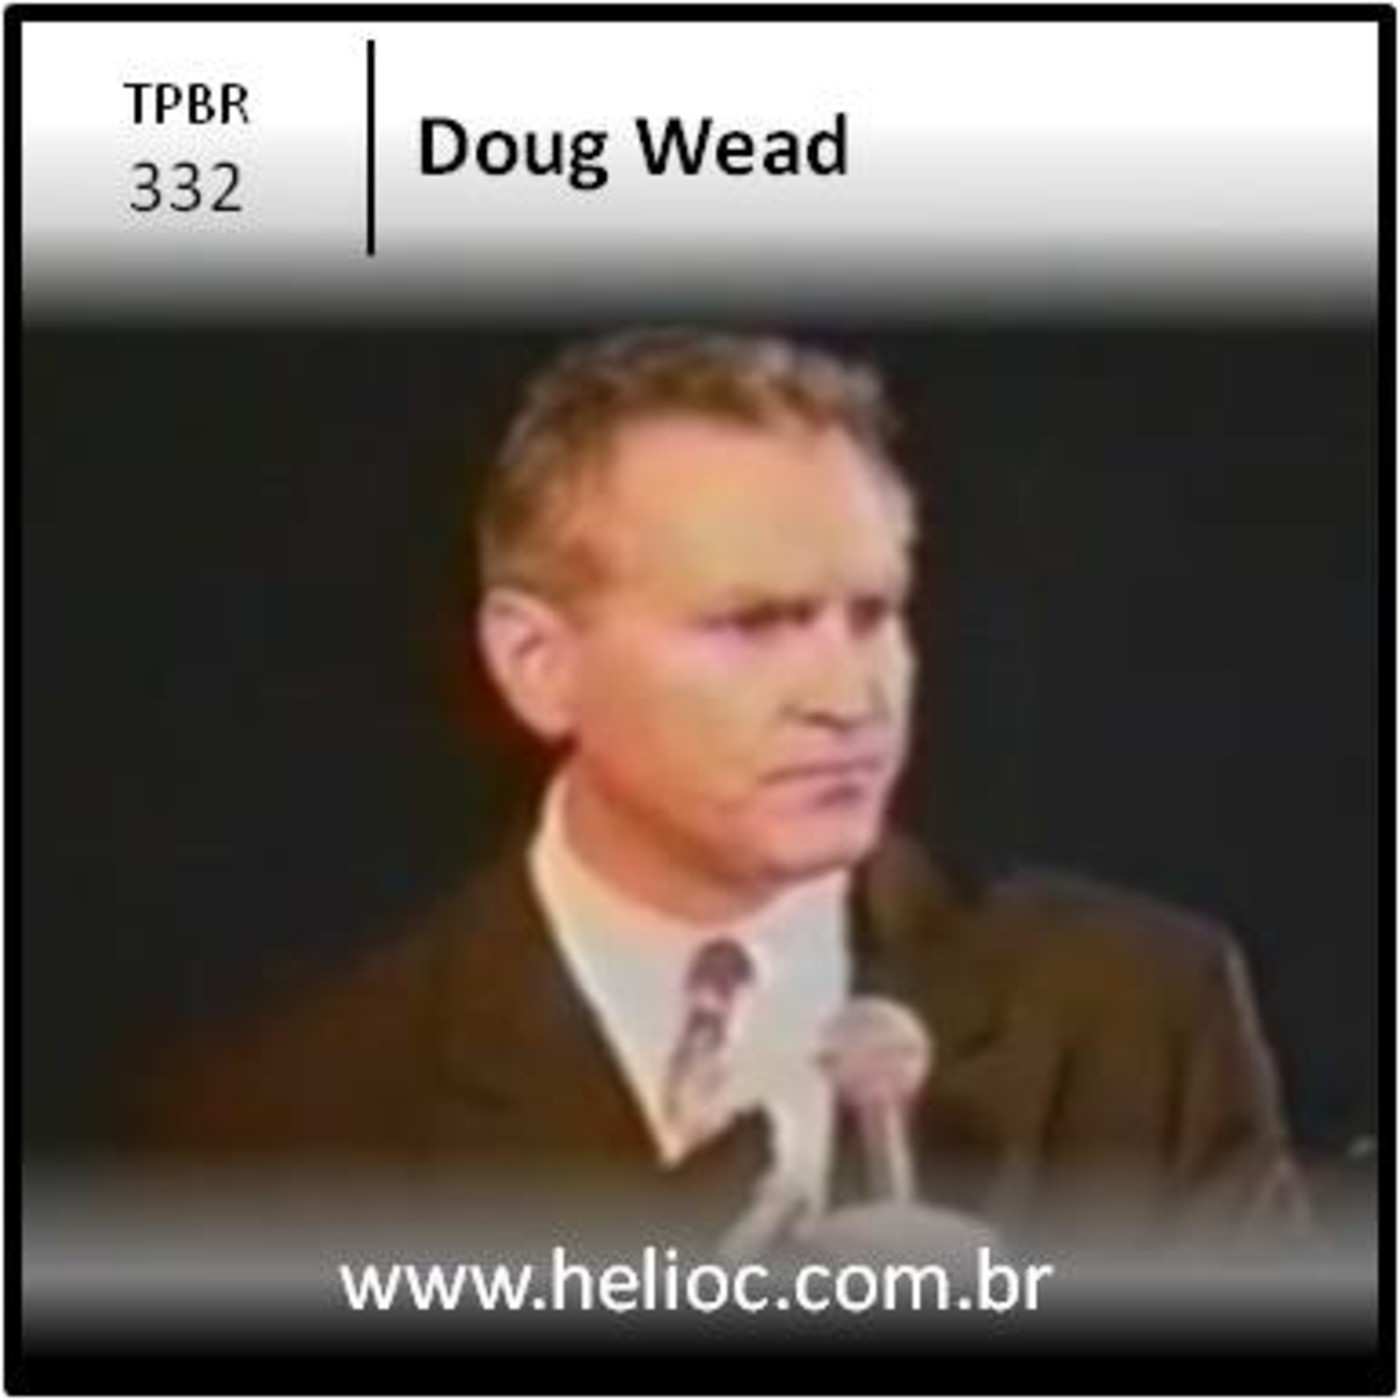 TPBR 332 - 1000 Perguntas 4 Respostas - Doug Wead